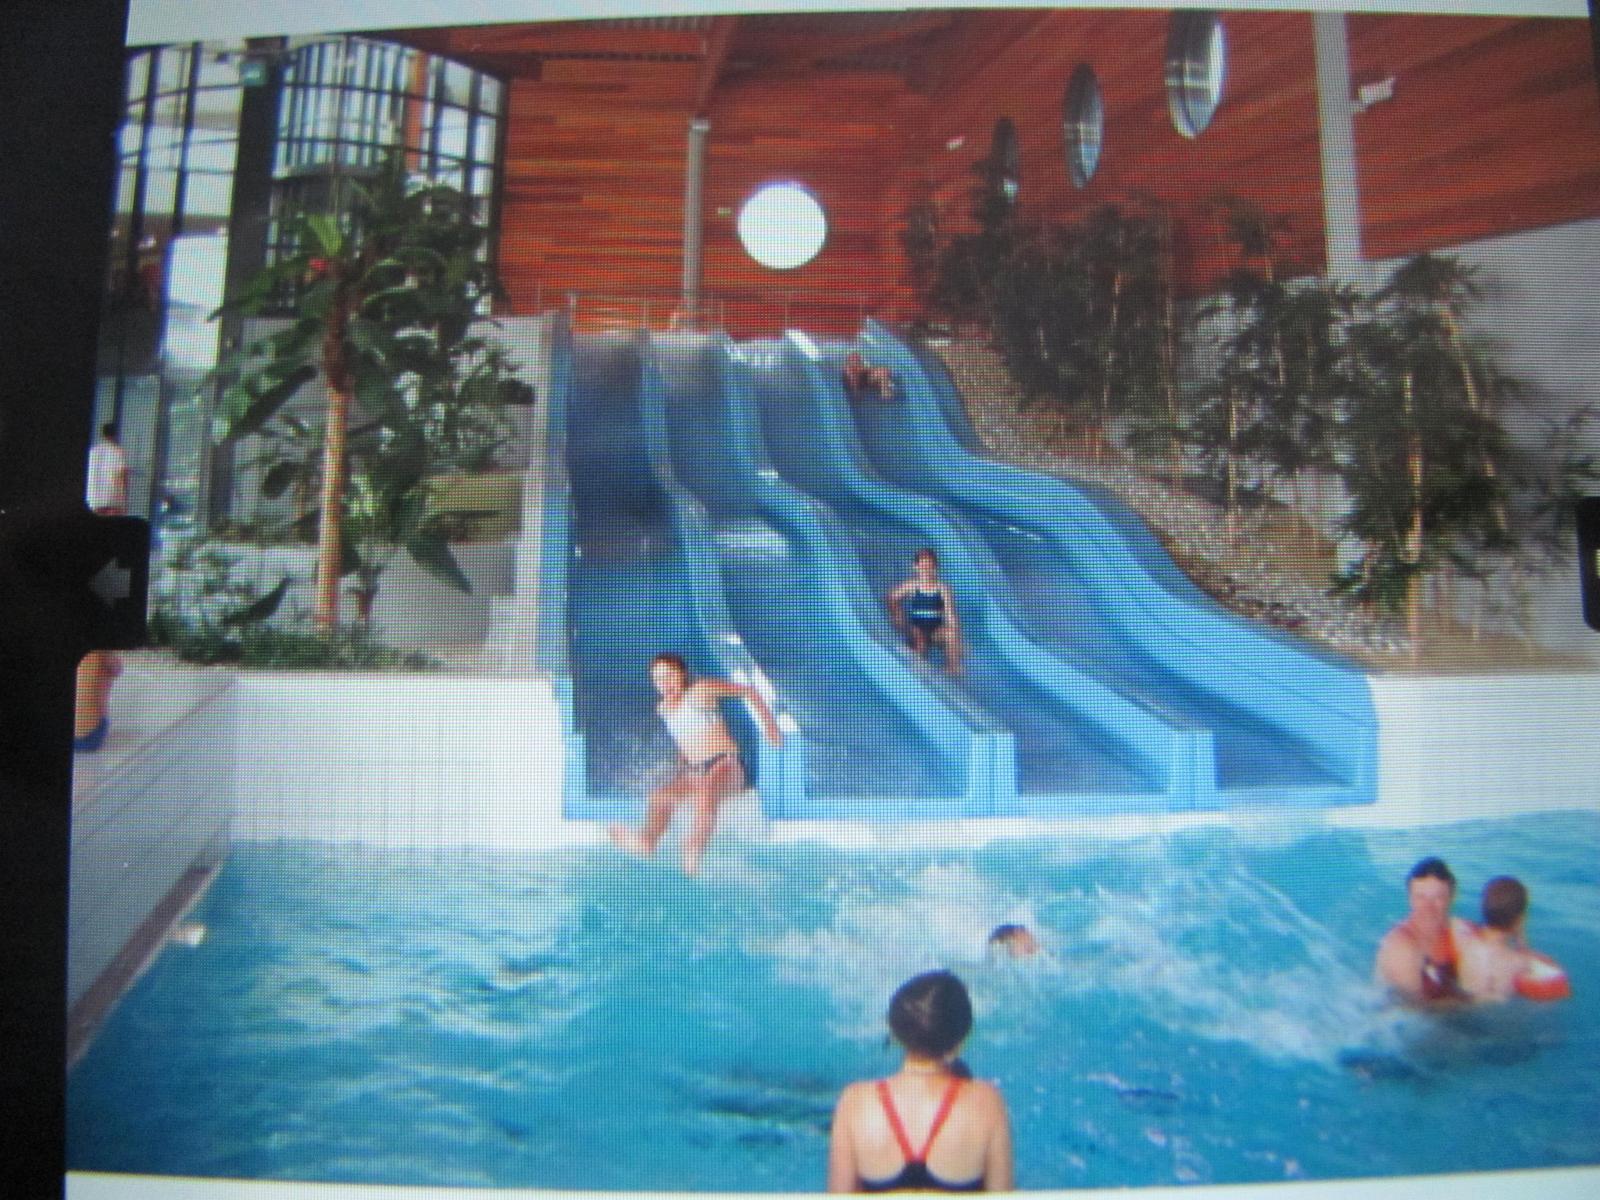 Piscine Centre Aqua'rel : Piscine Lons Le Saunier 39000 ... tout Piscine Aquarel Lons